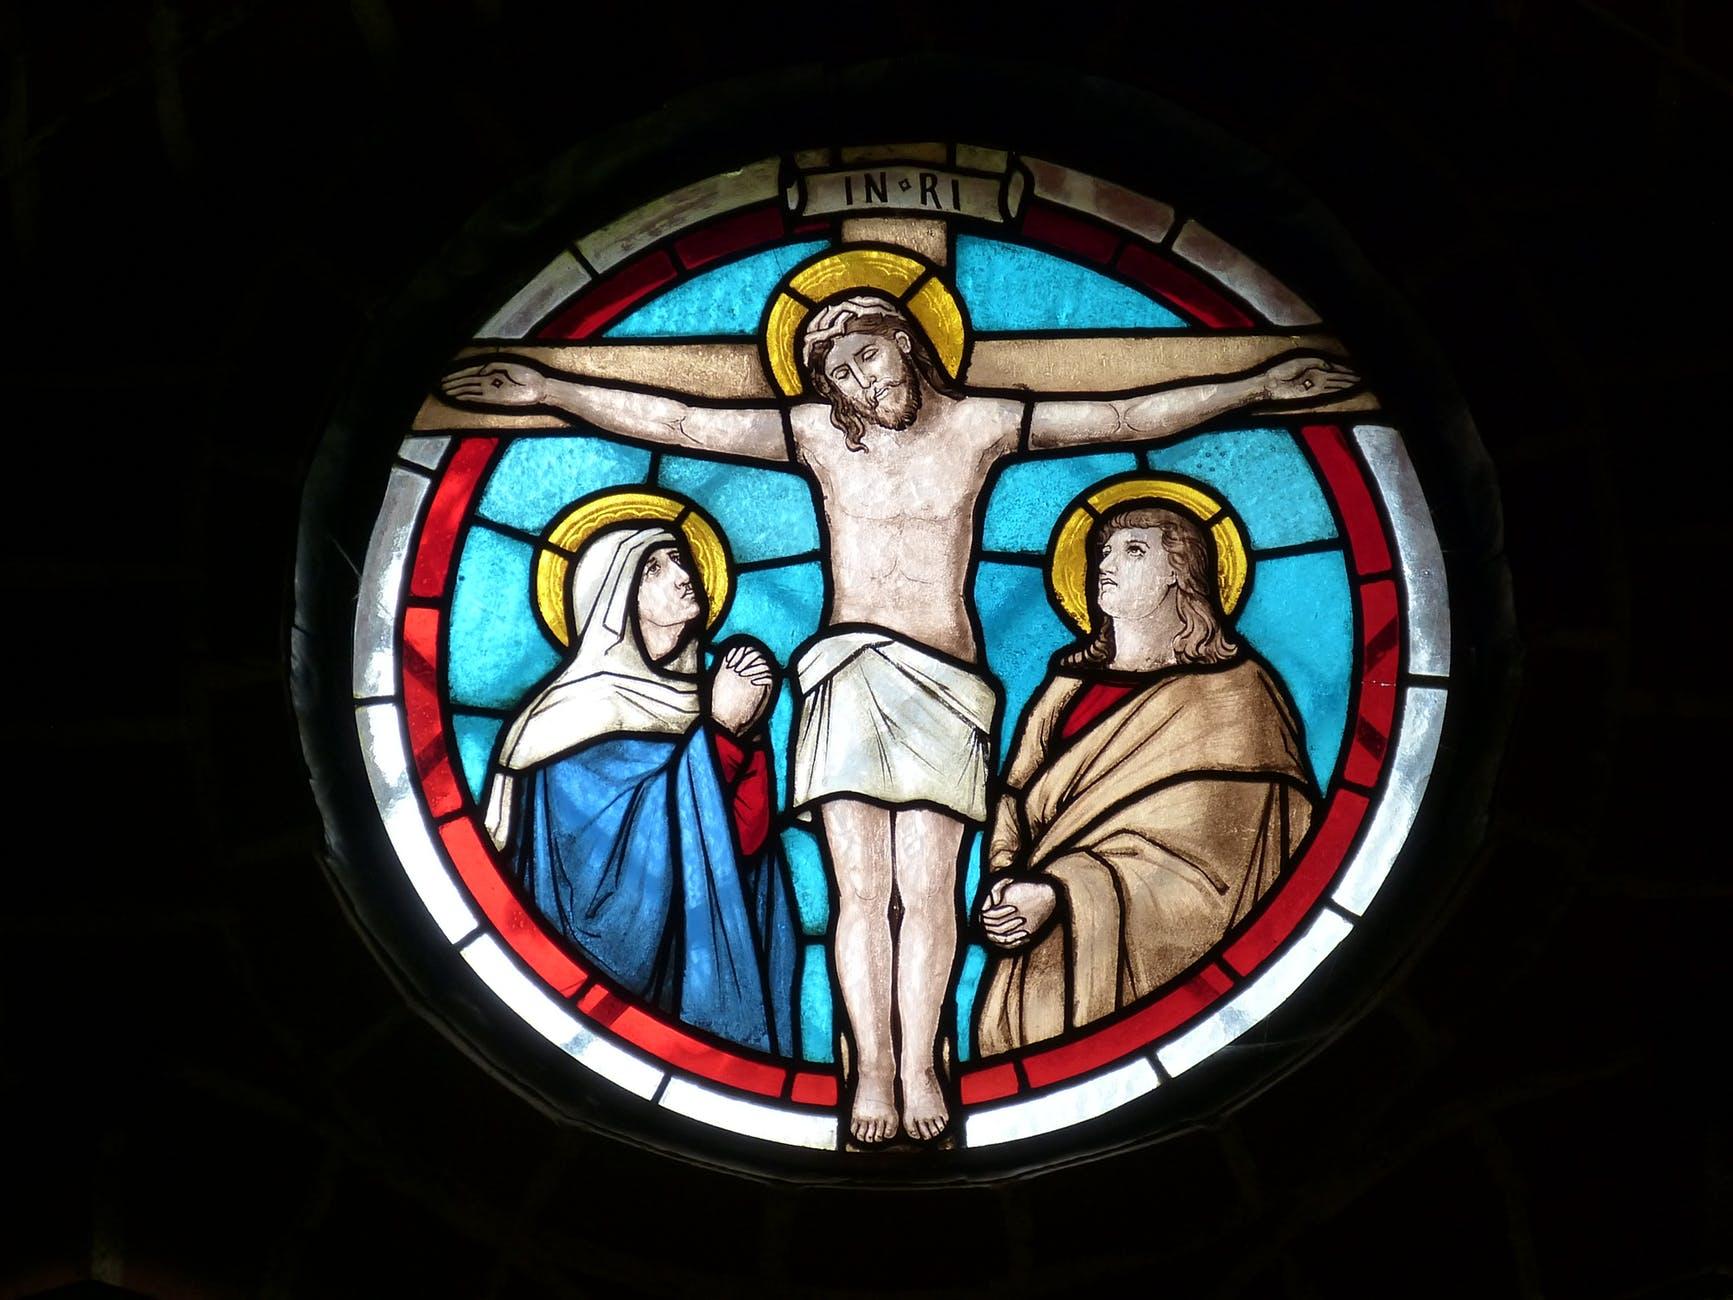 church-window-church-window-stained-glass-46154.jpeg